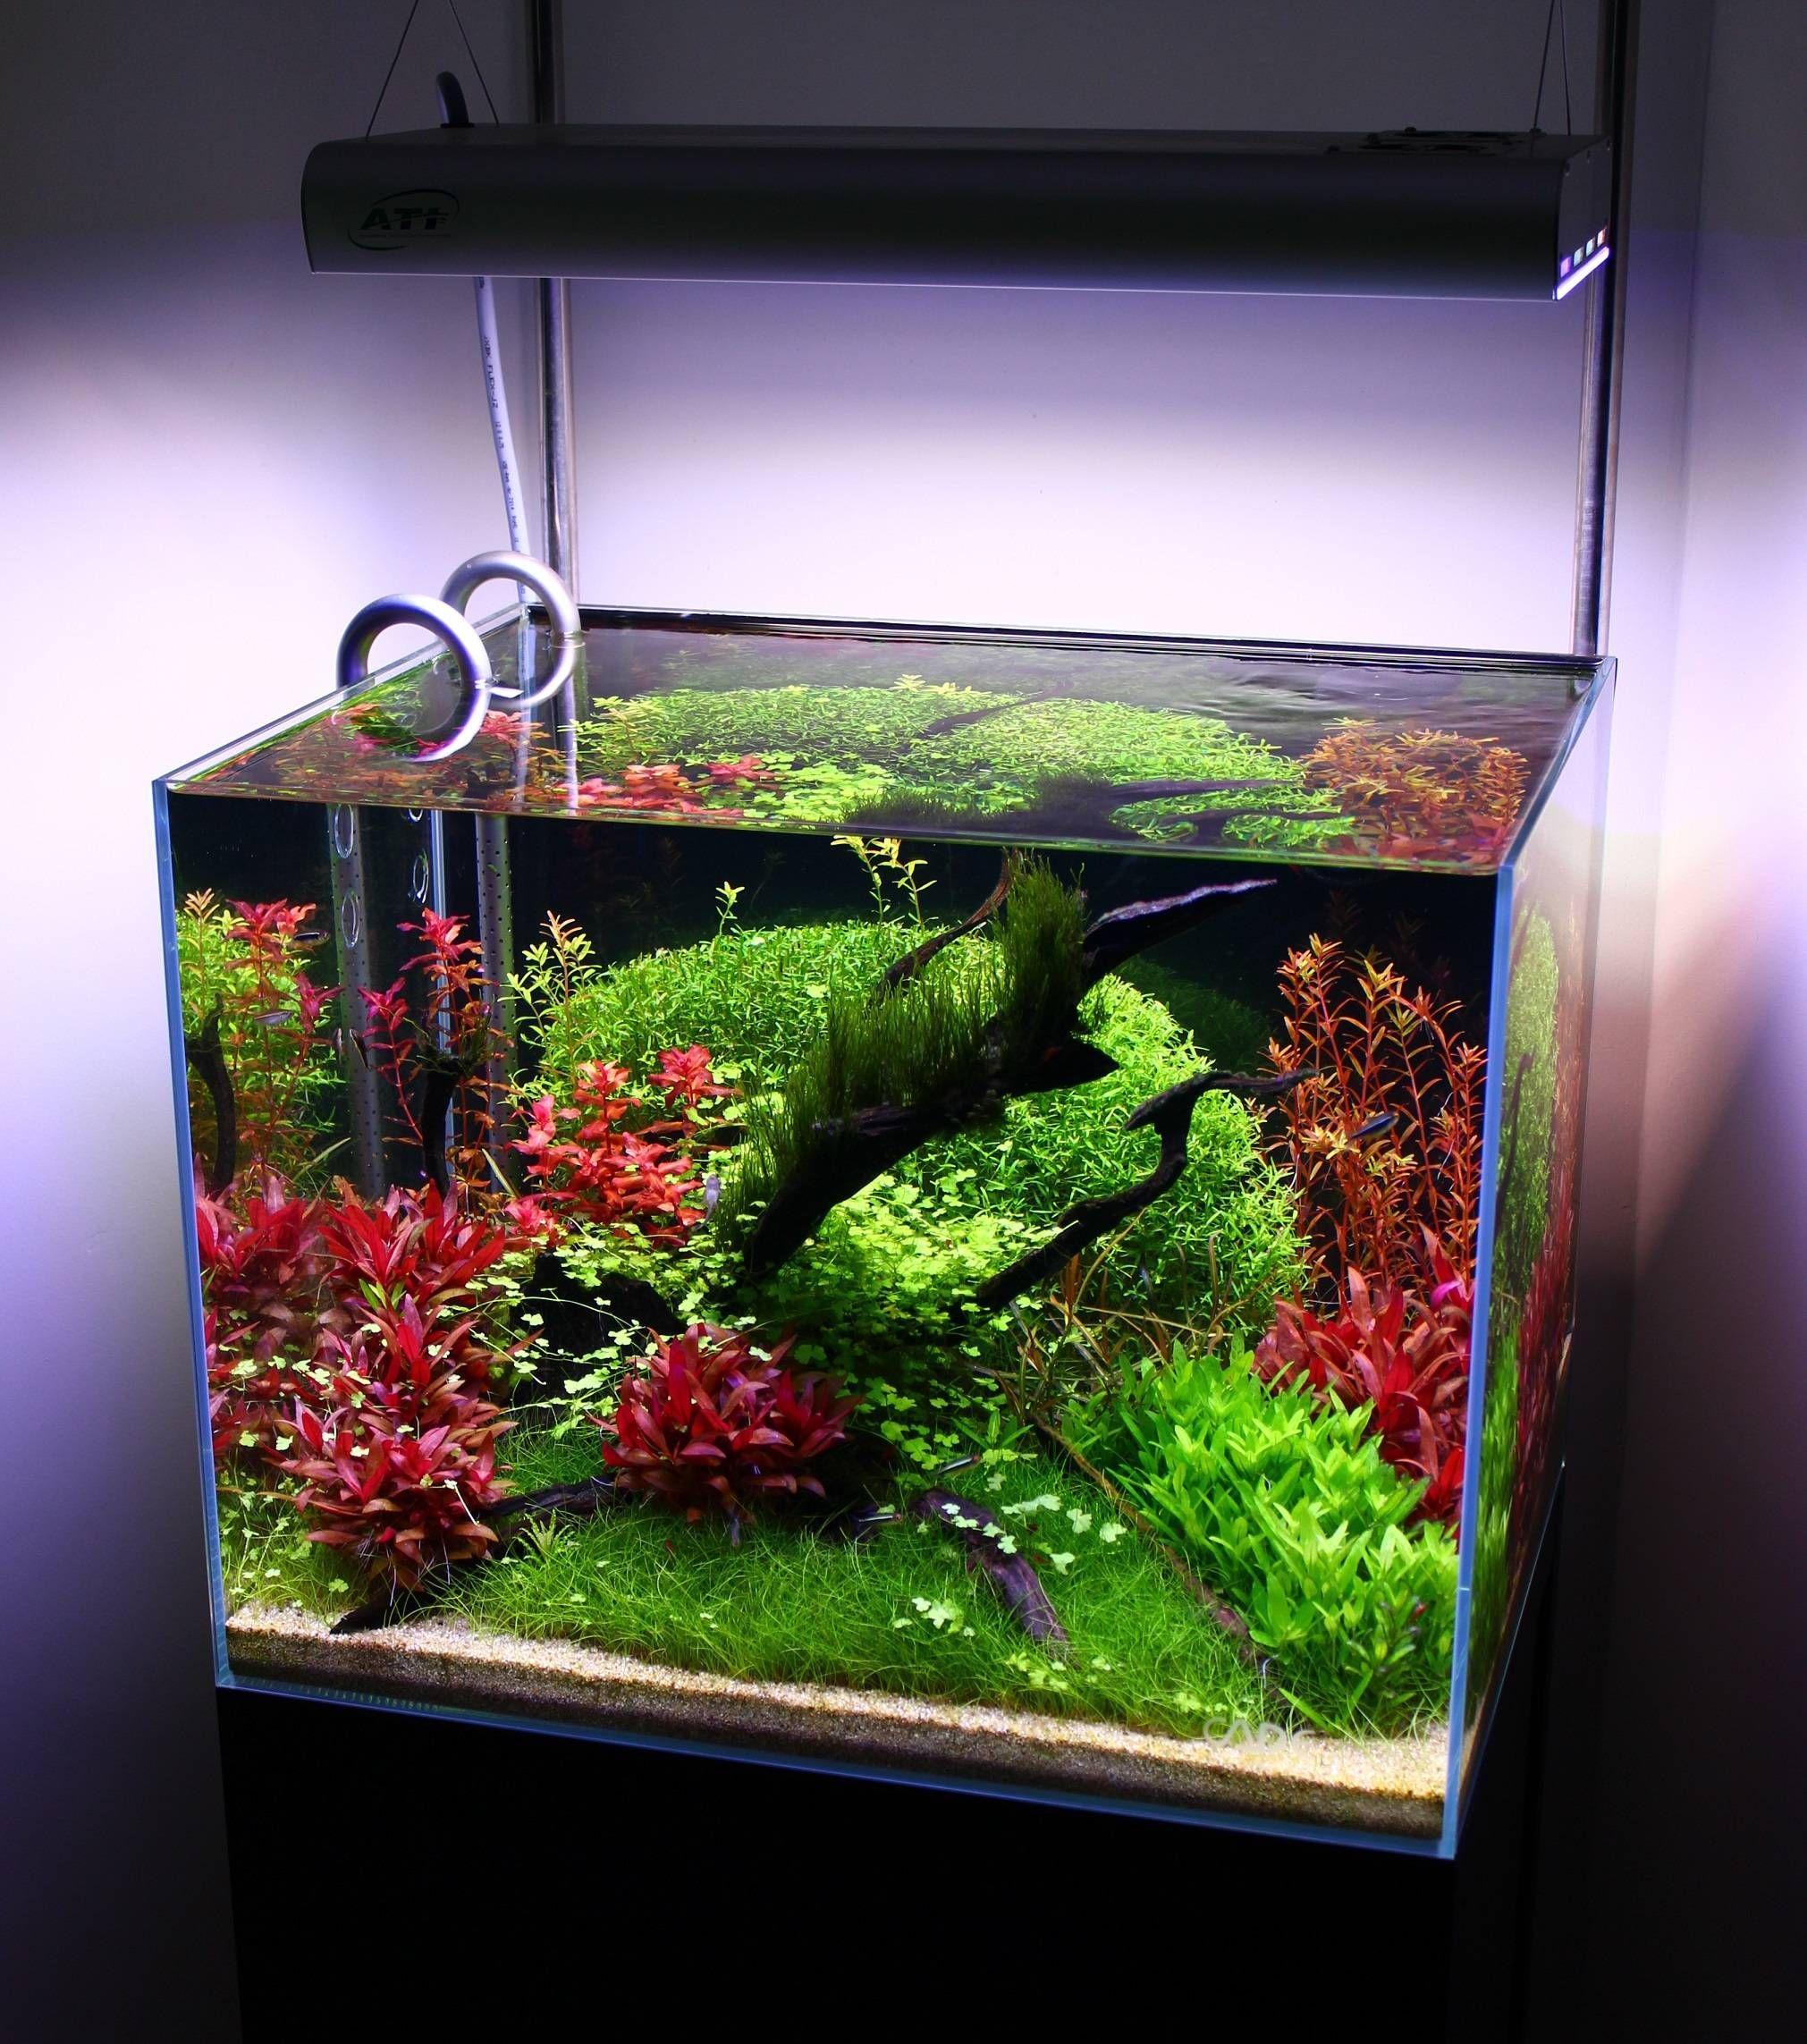 Freshwater aquarium fish nano - Red And Green Planted Tank Planted Aquariumaquarium Fishfreshwater Aquariumnano